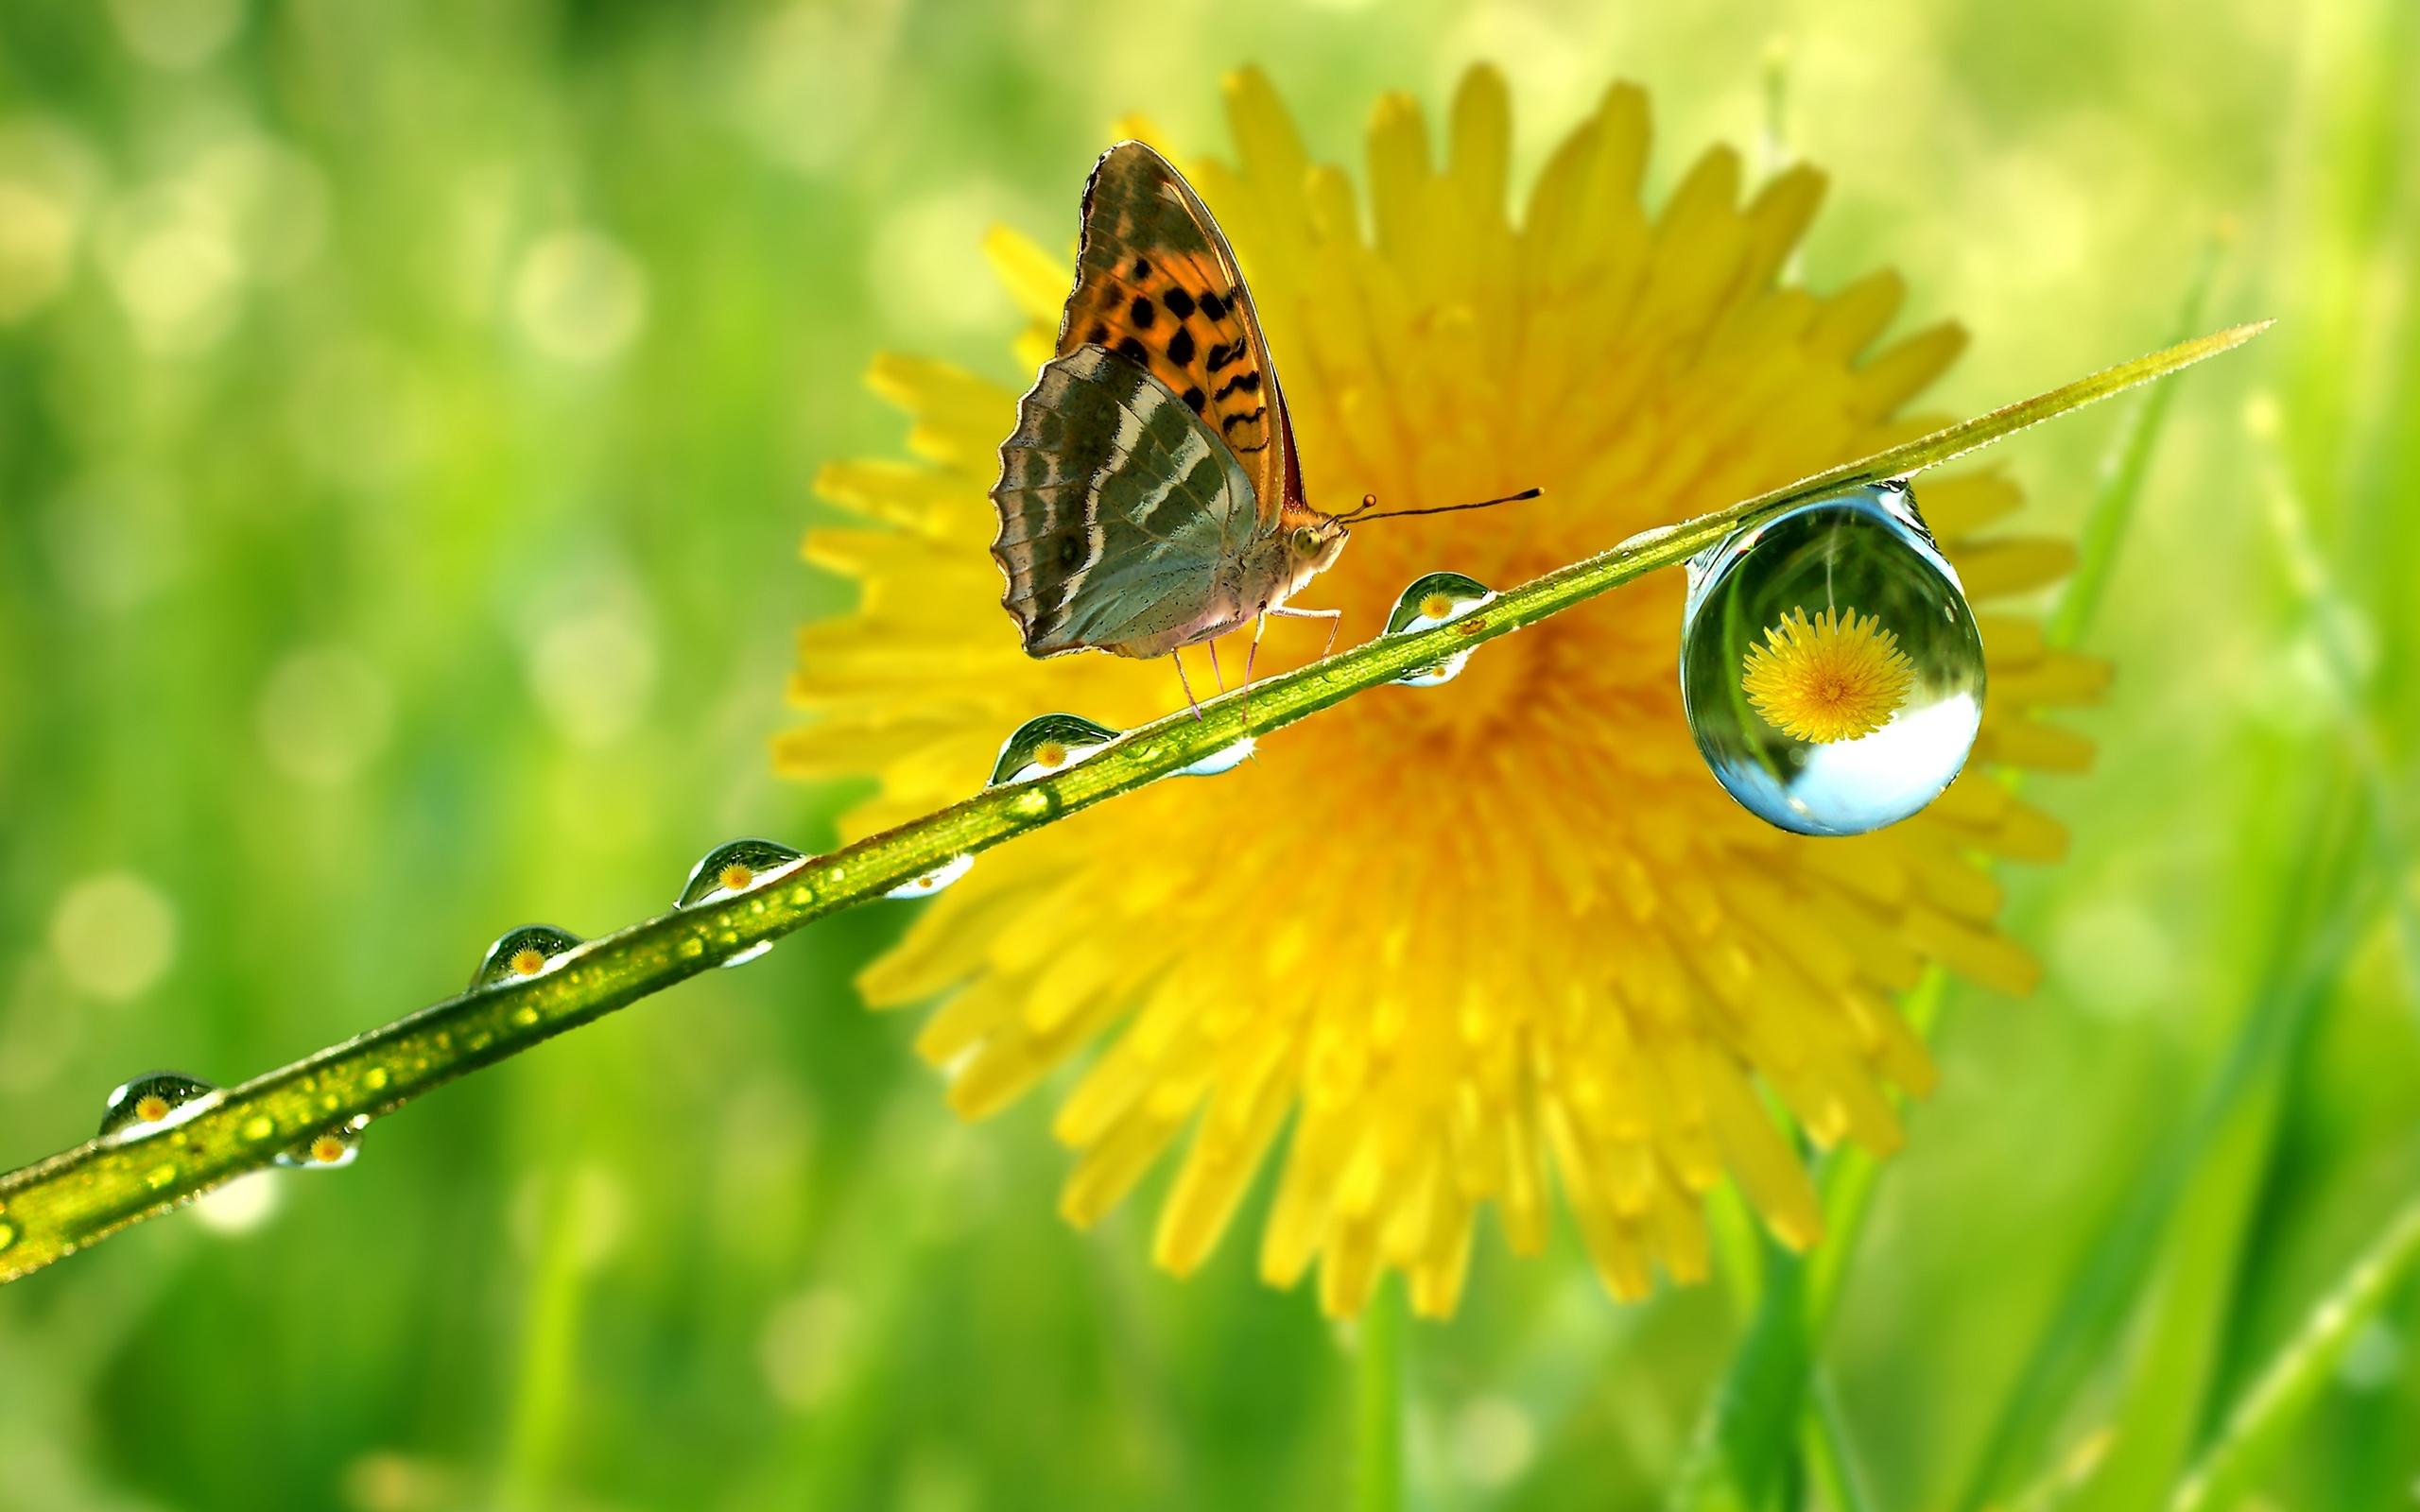 Butterfly in front of flower